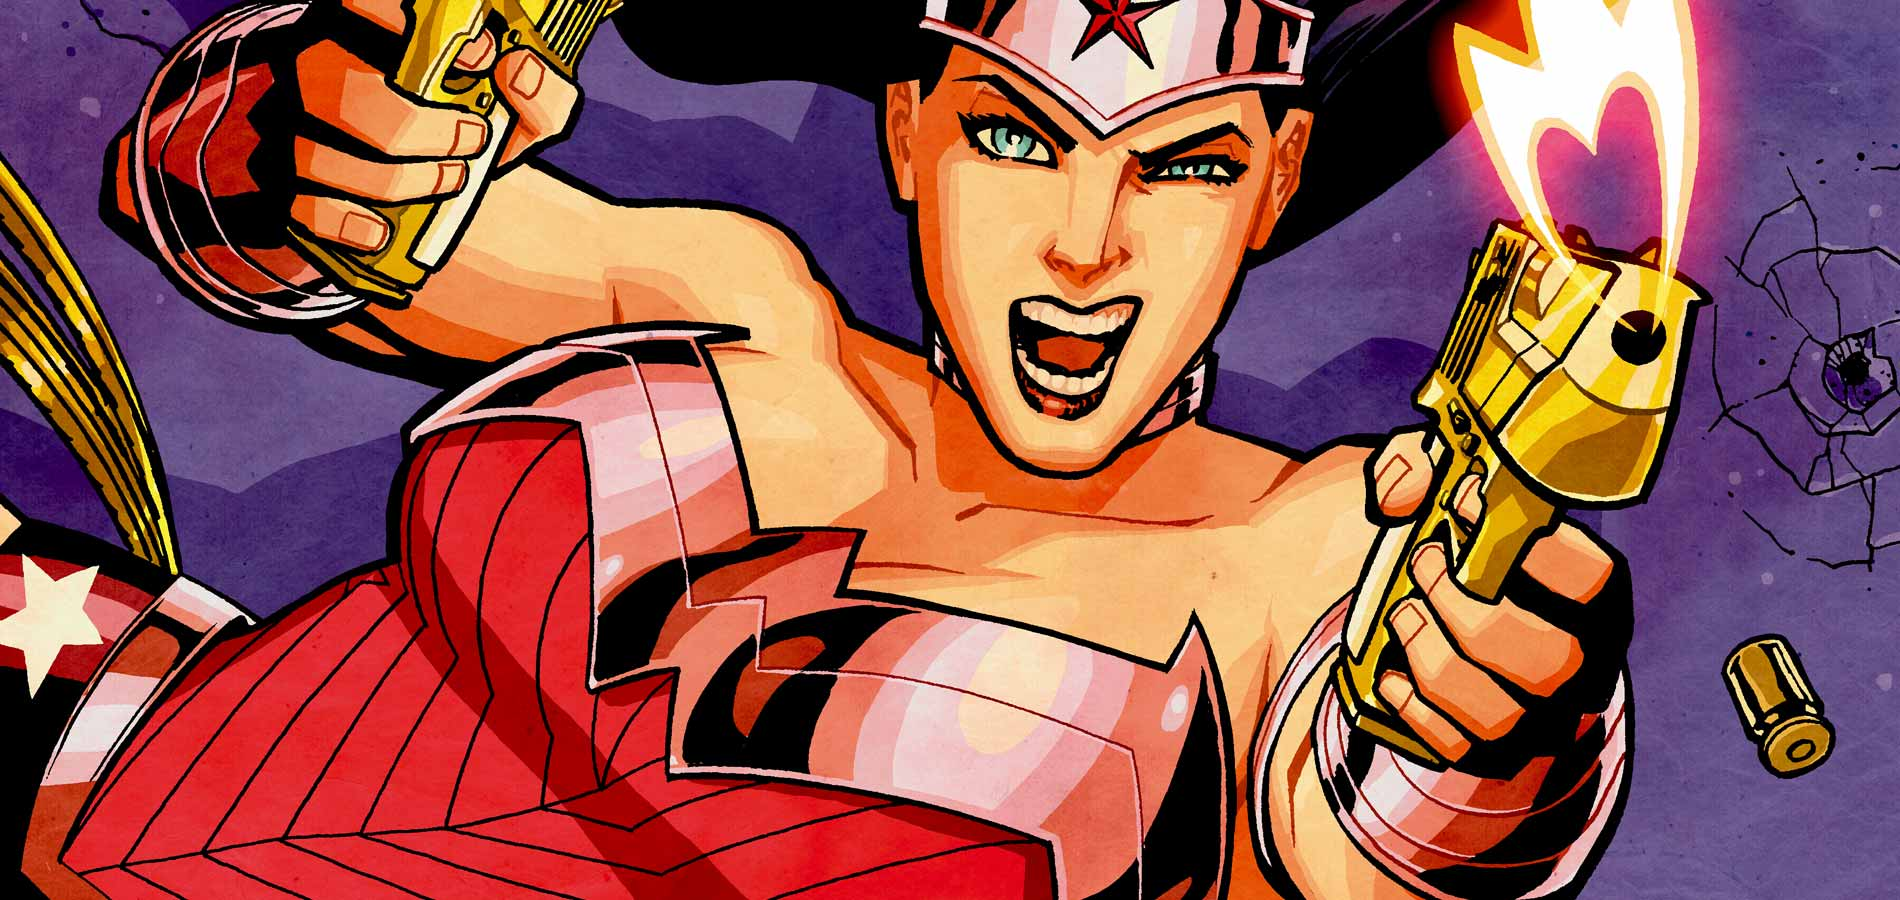 Photo Courtesy of DC Comics